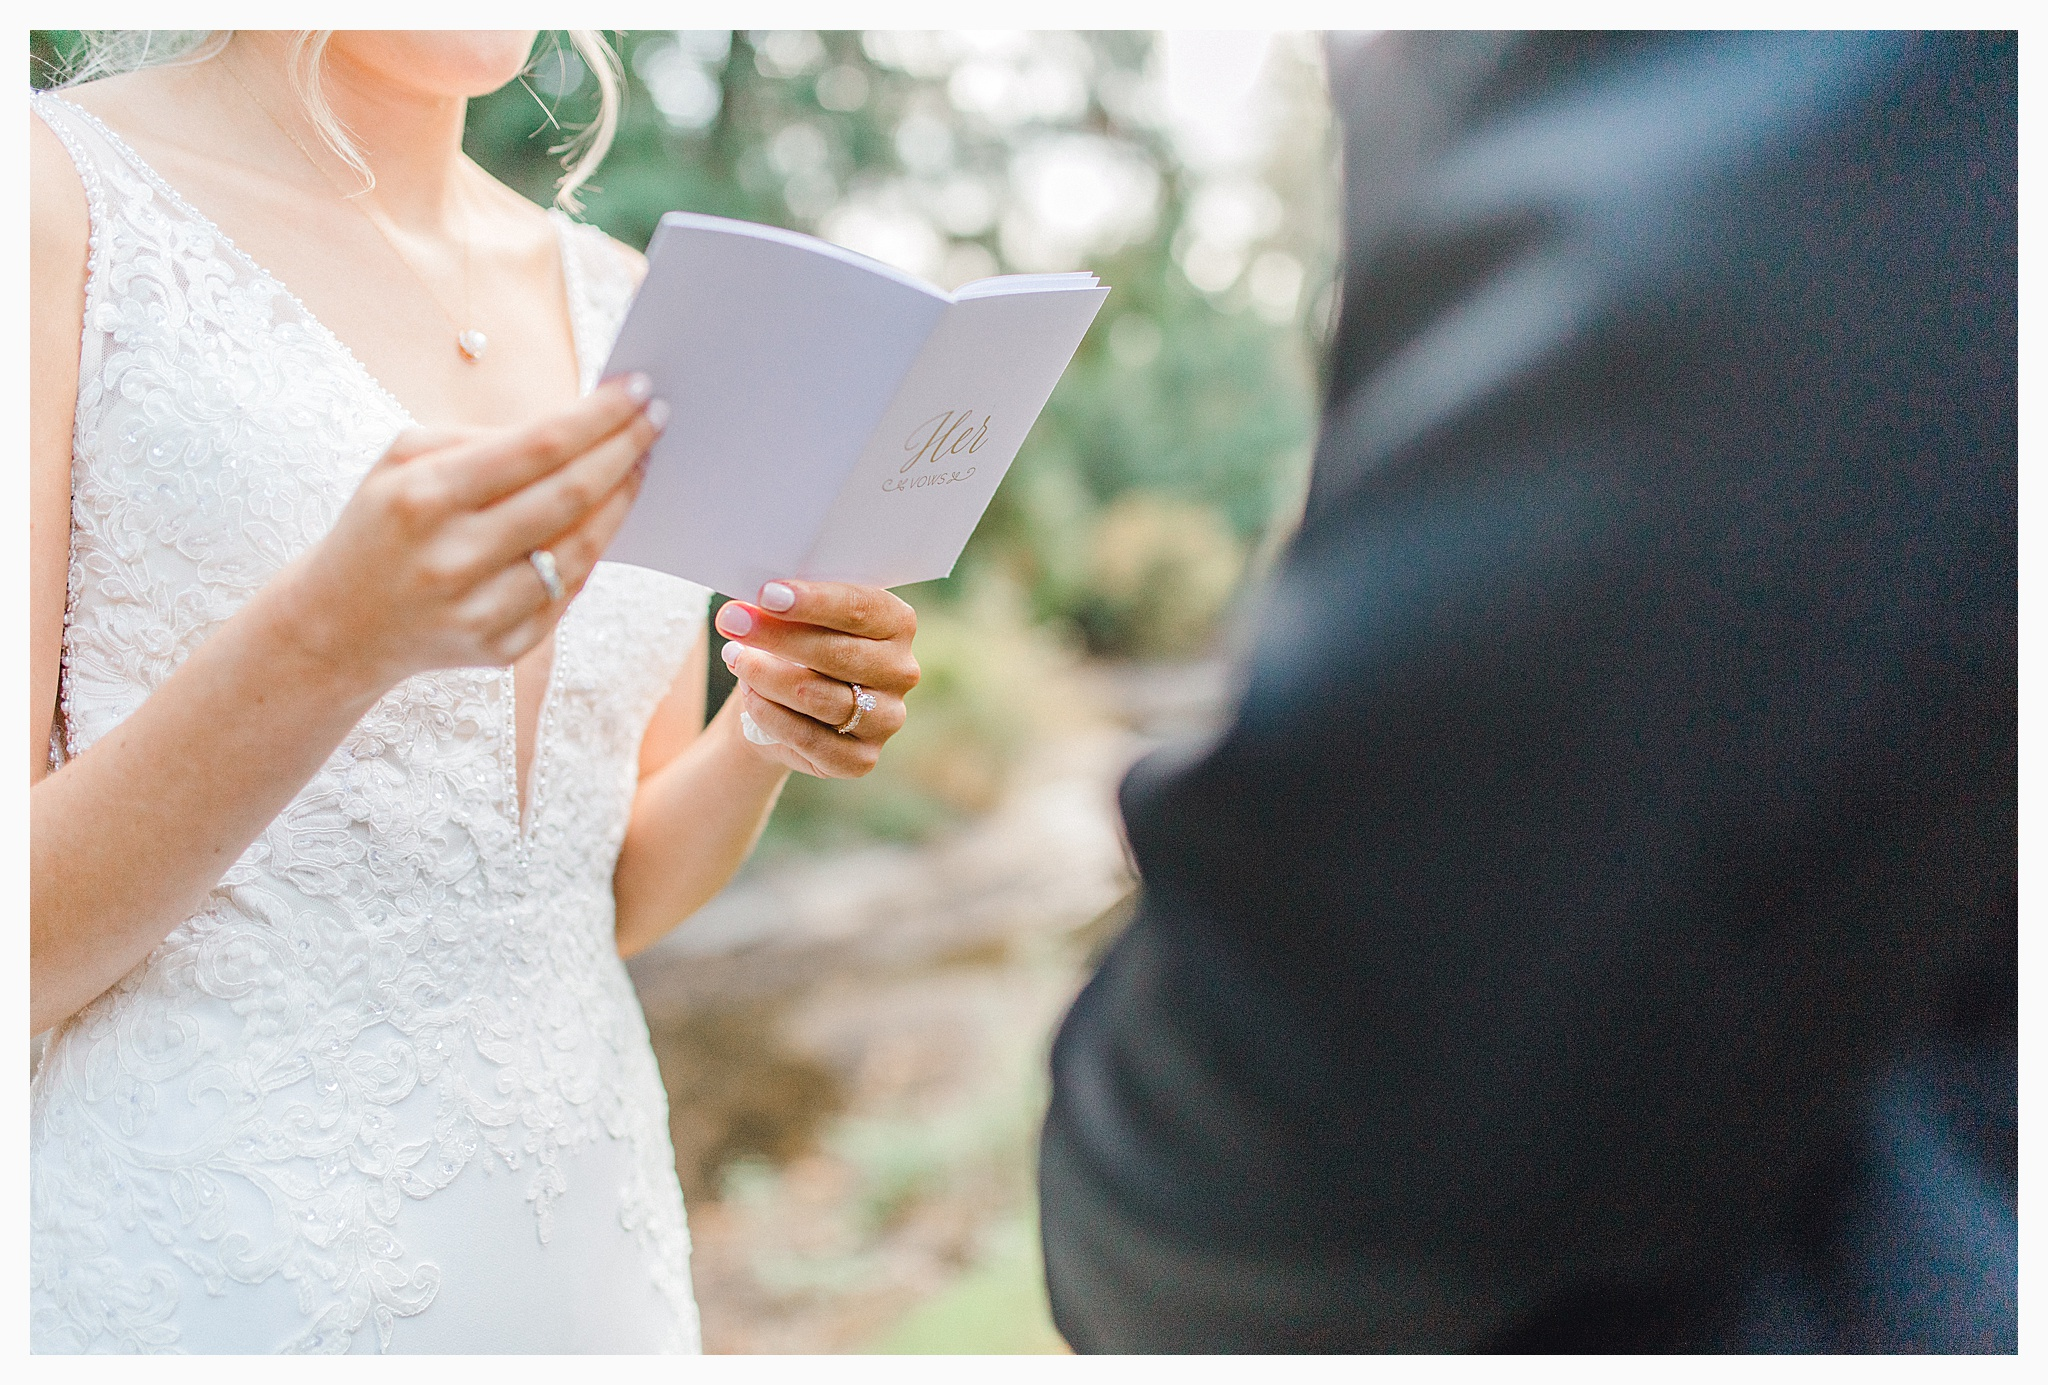 Emma Rose Company Light and Airy Wedding Photographer, Beautiful fall wedding at Rock Creek Gardens Venue in Puyallup, Washington._0025.jpg